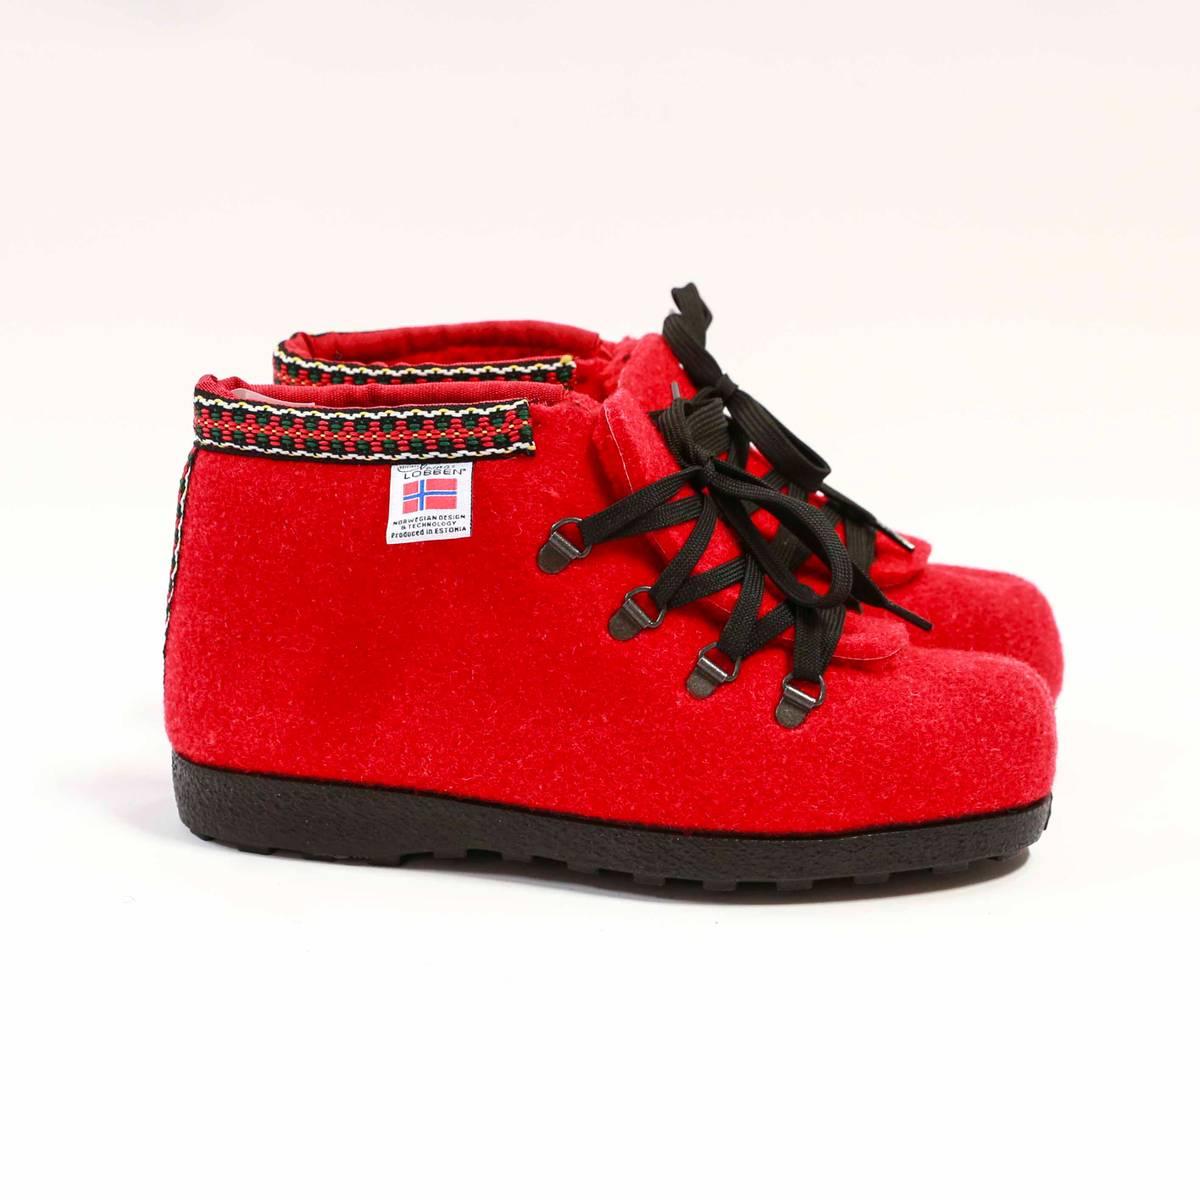 Nesnalobben Afterski sko rød